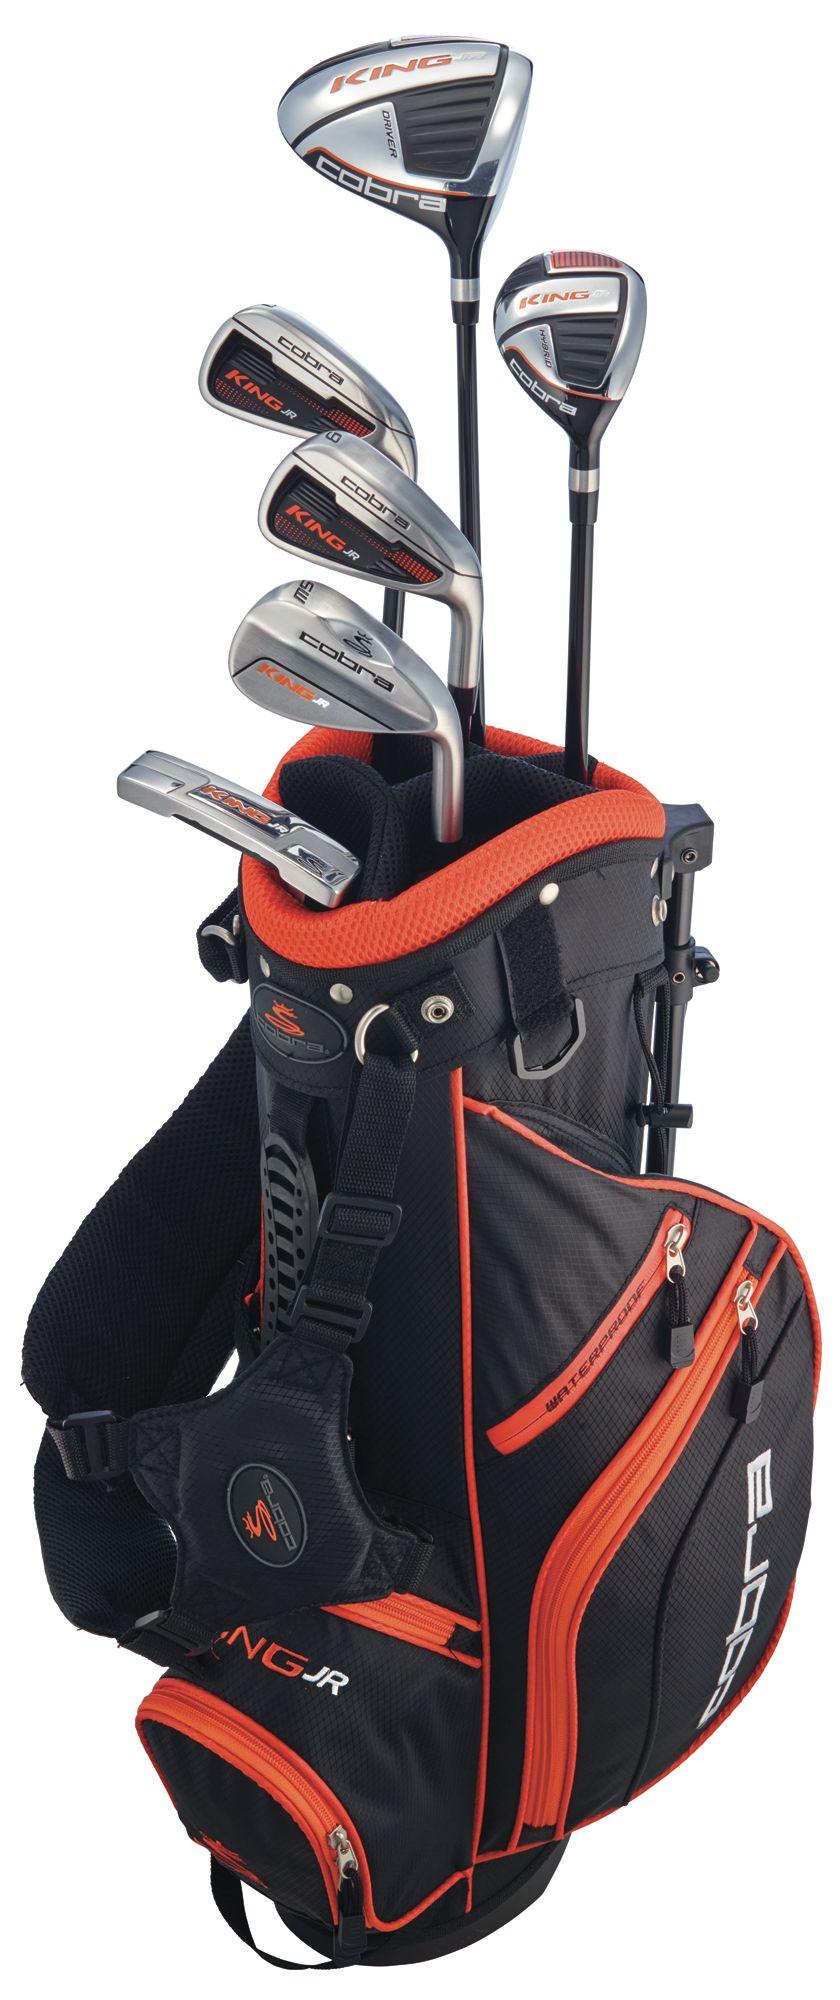 Kids Golf Club Sets-Cobra King Golf Club Set